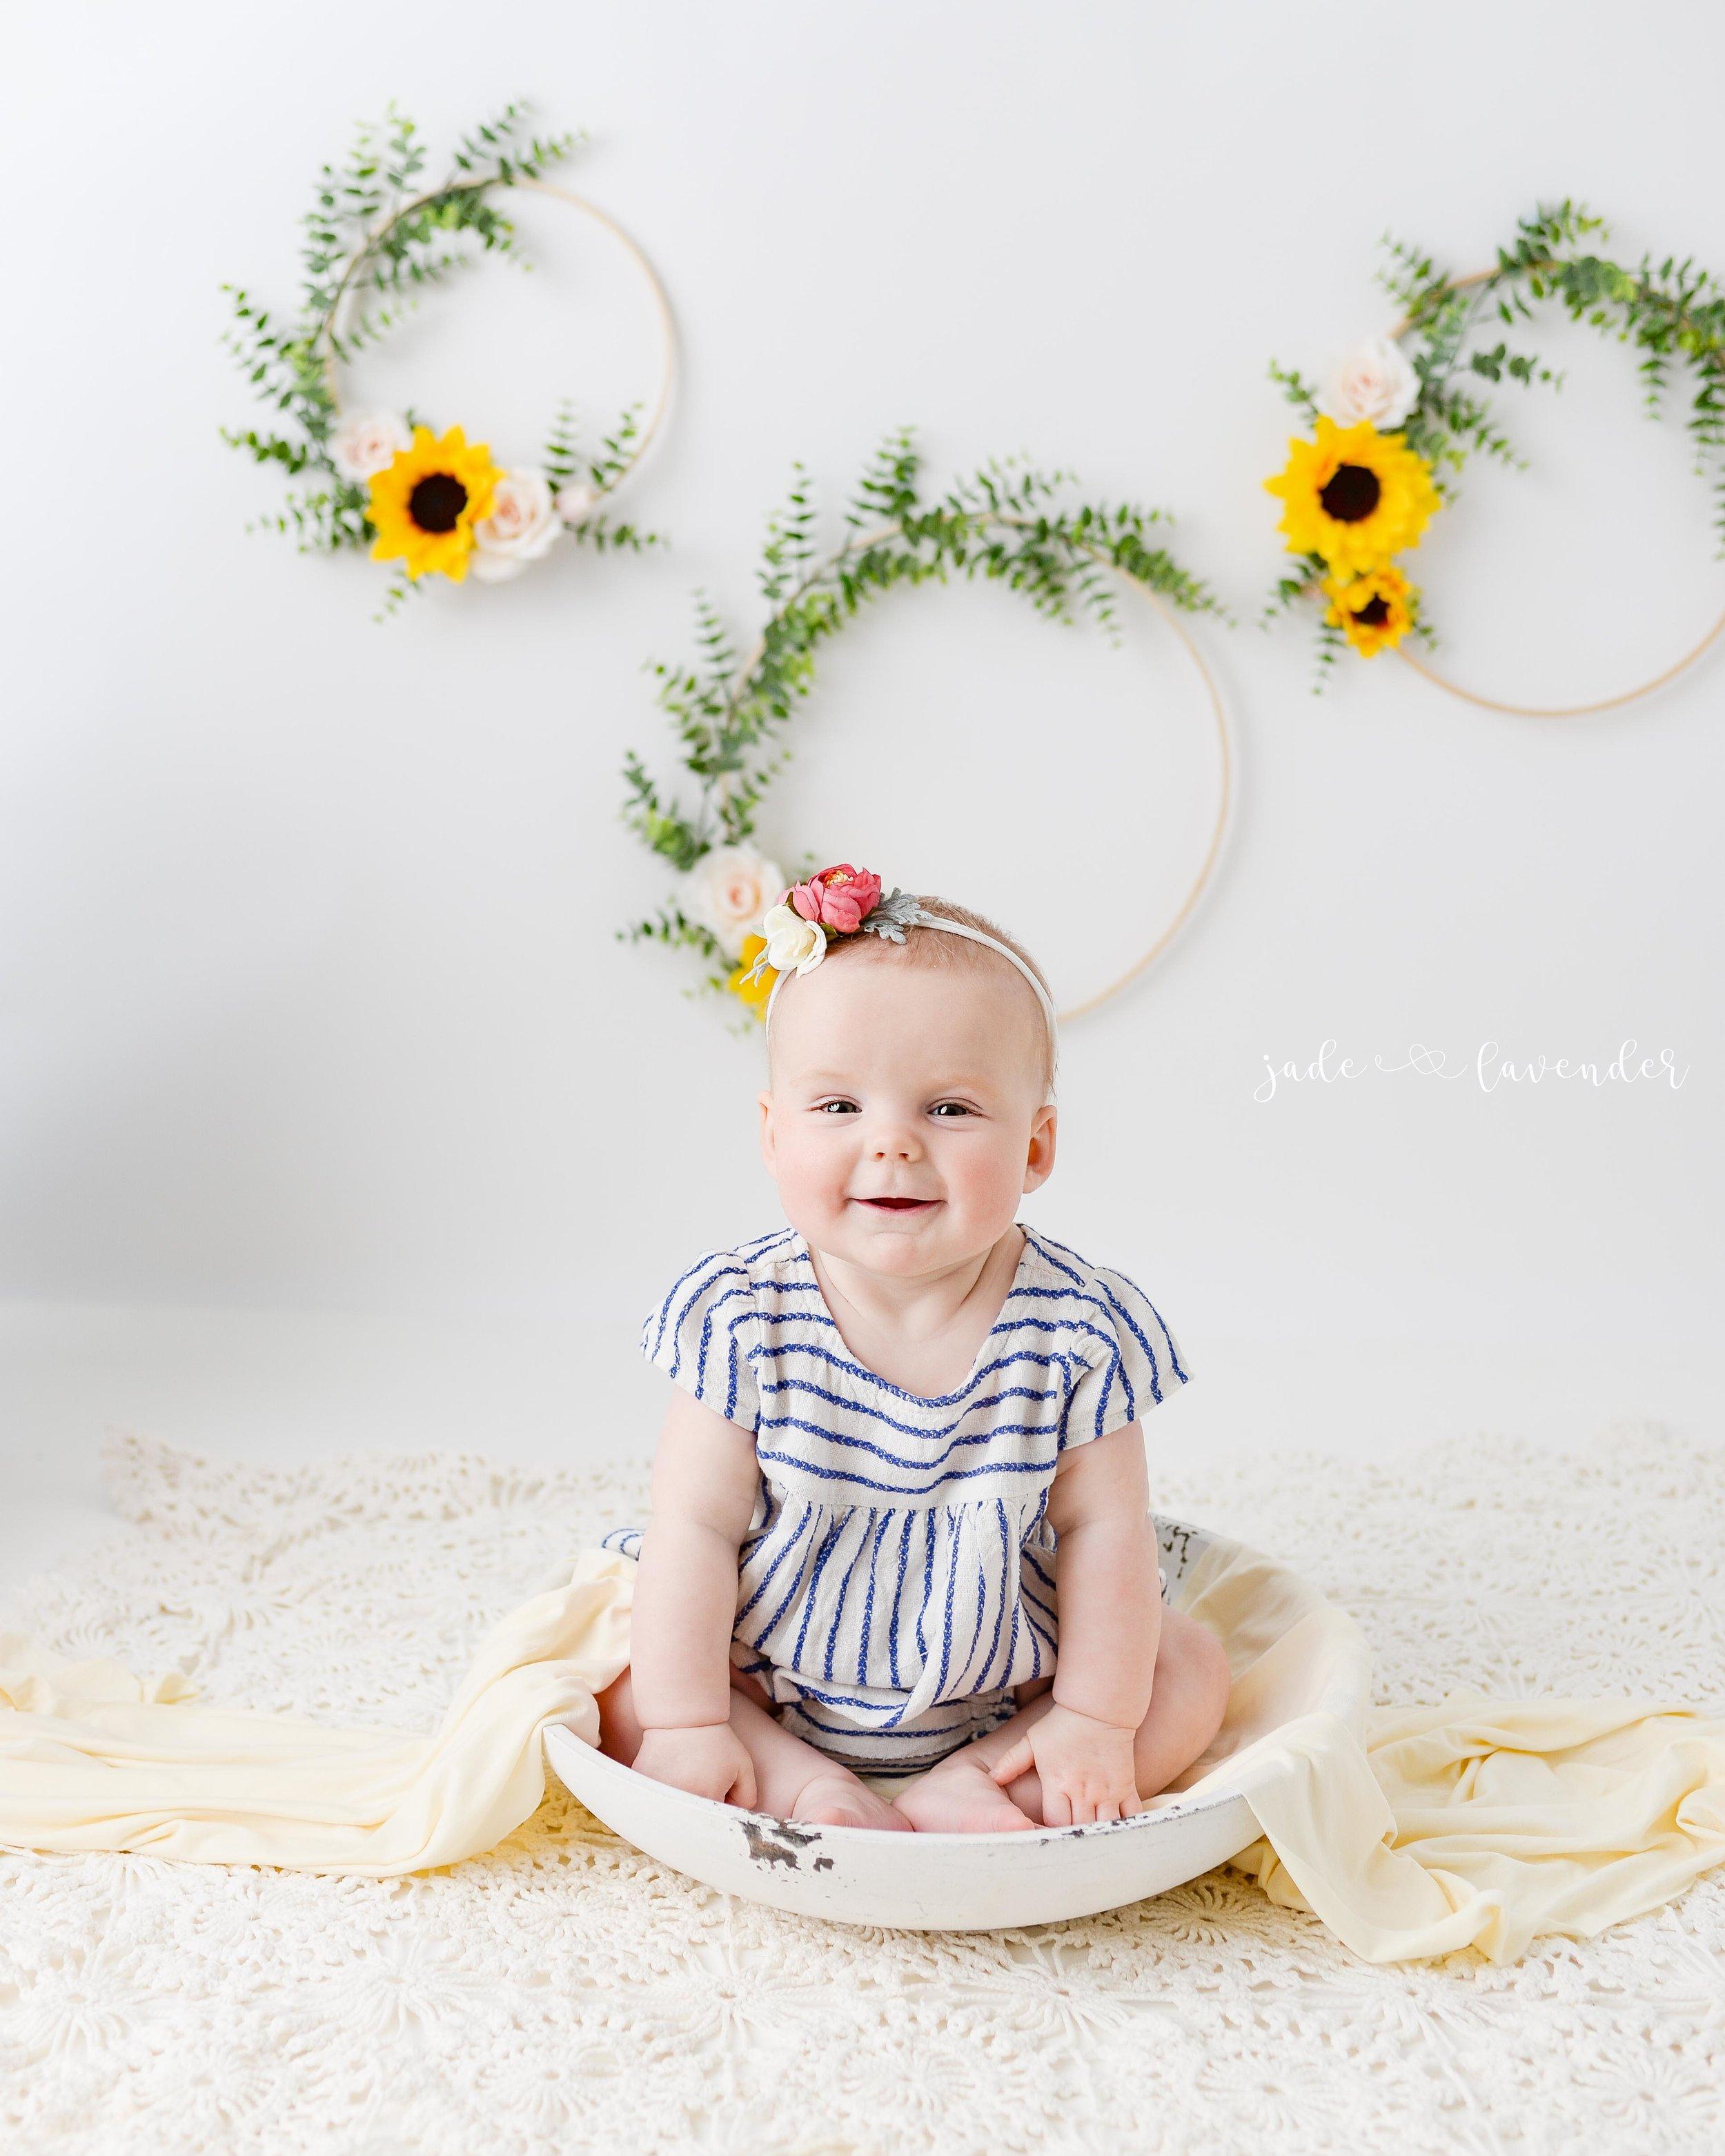 Baby-girl-milestone-milkbath-six-month-newborn-photography-infant-images-baby-photos-photographer-spokane-washington (2 of 5).jpg